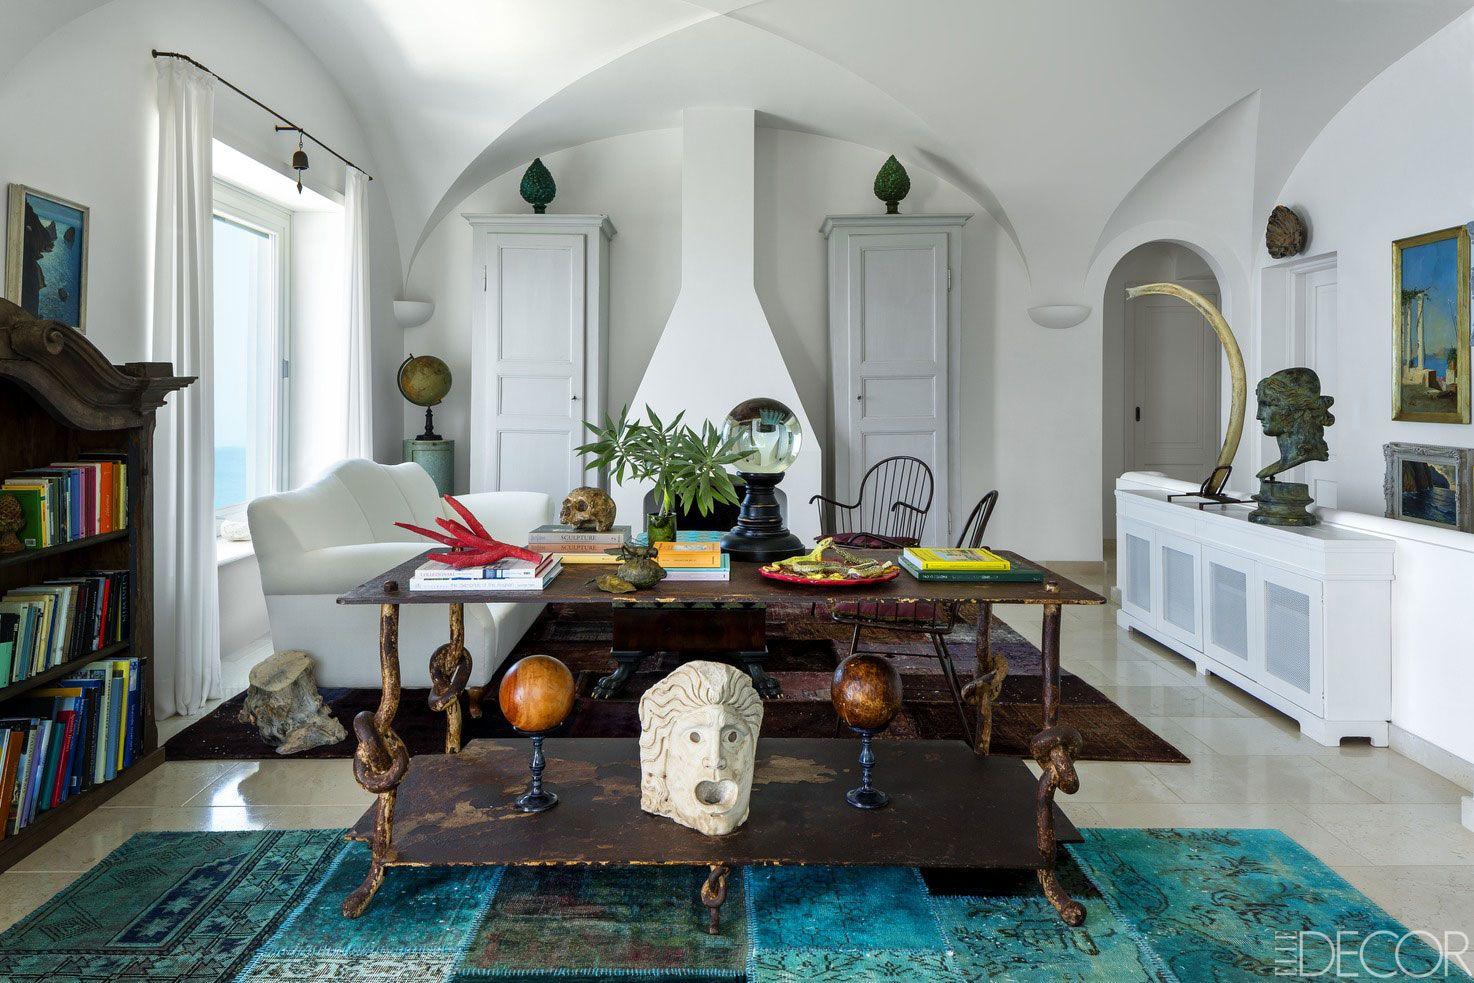 14 Ways To Decorate An Awkward Corner